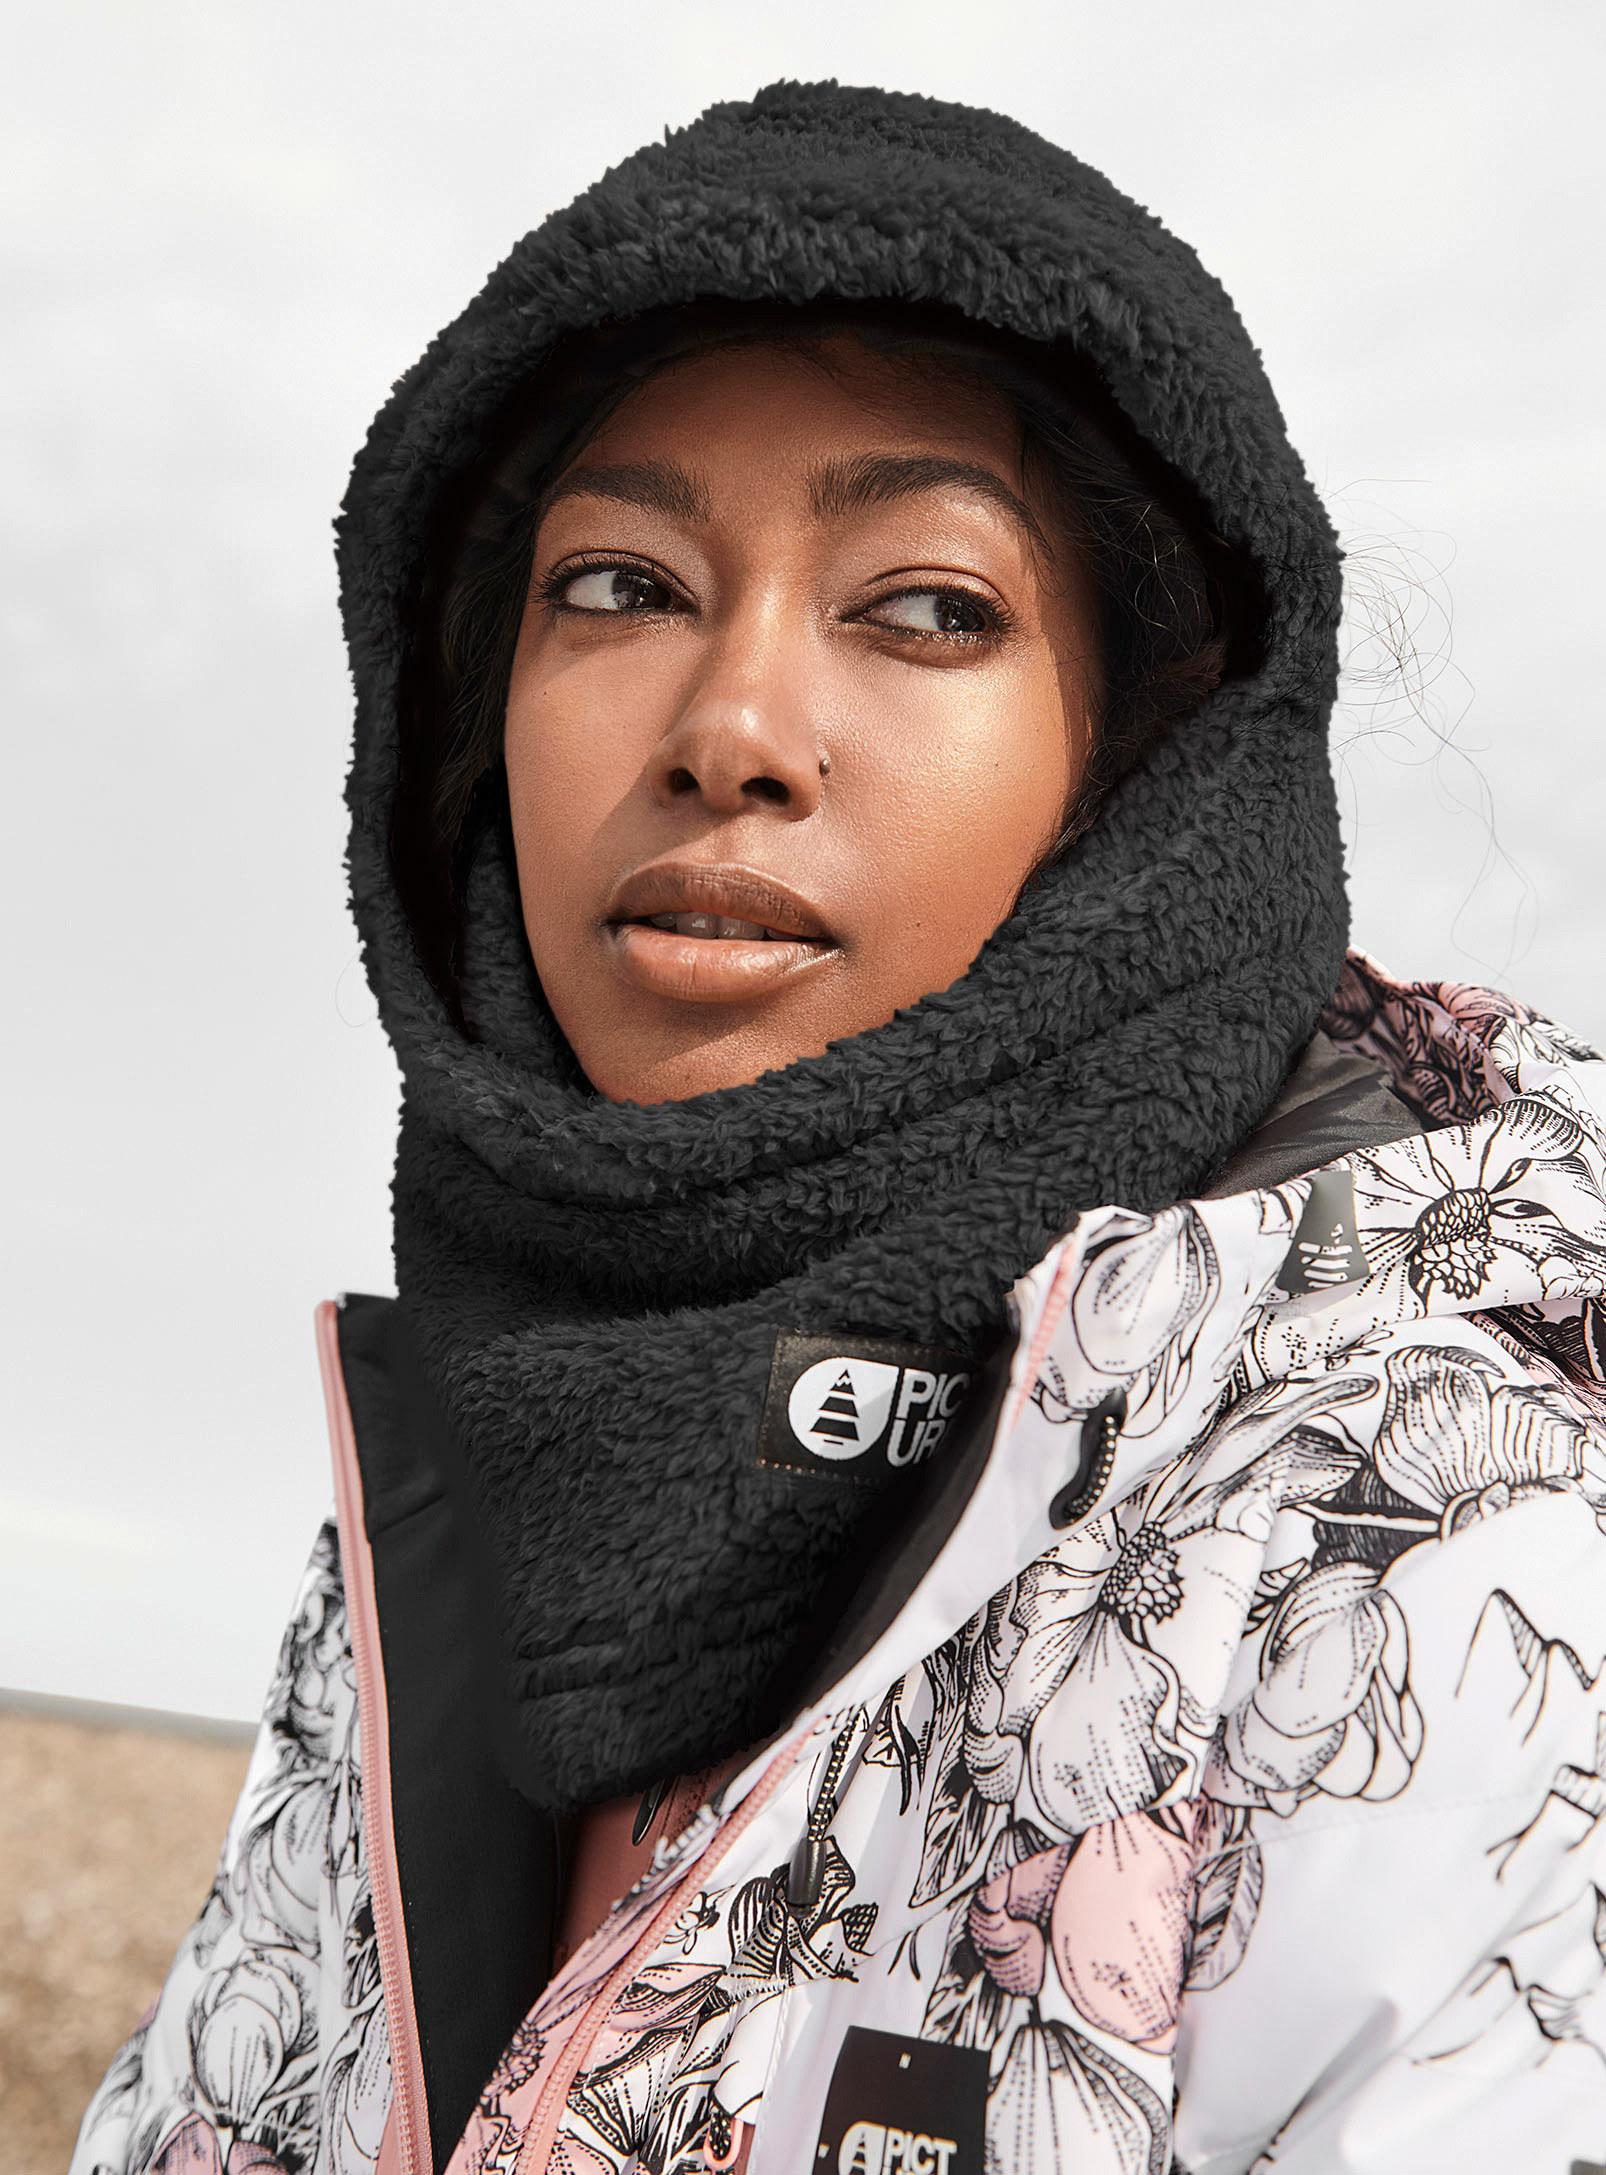 A person wearing a fleece balaclava and winter coat